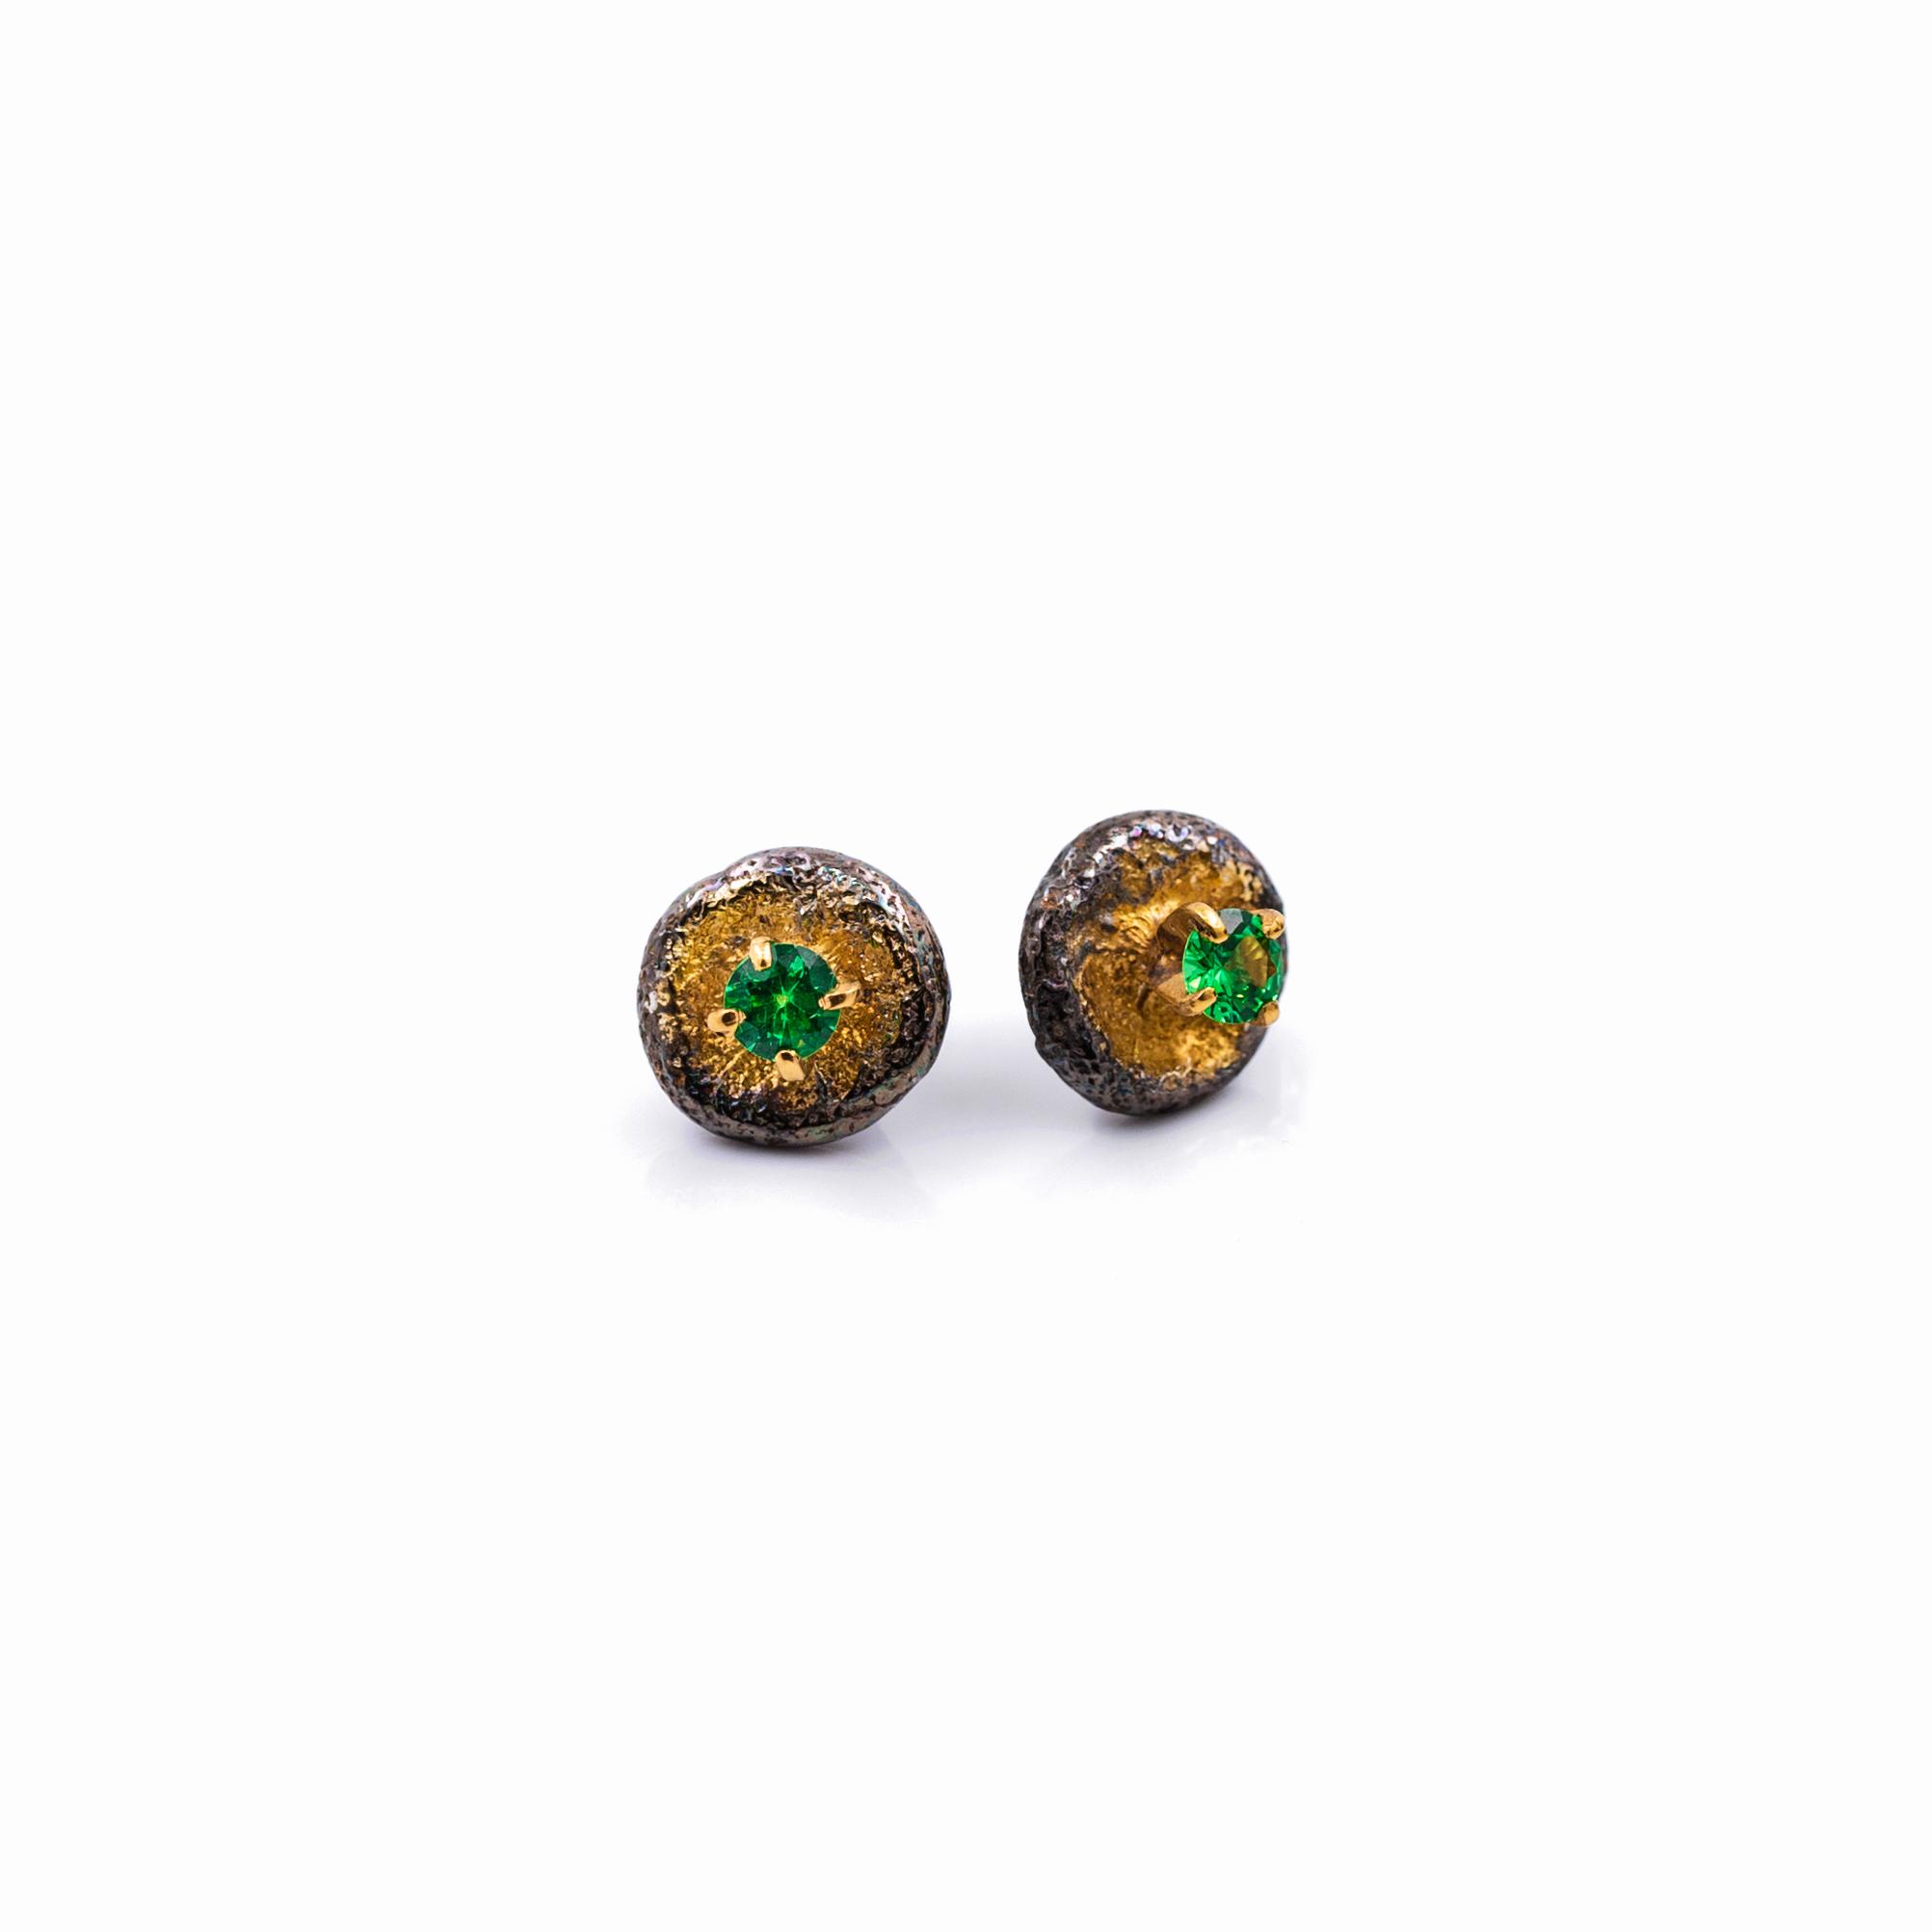 Bouton Earrings | Sterling silver, tsavorite garnet.